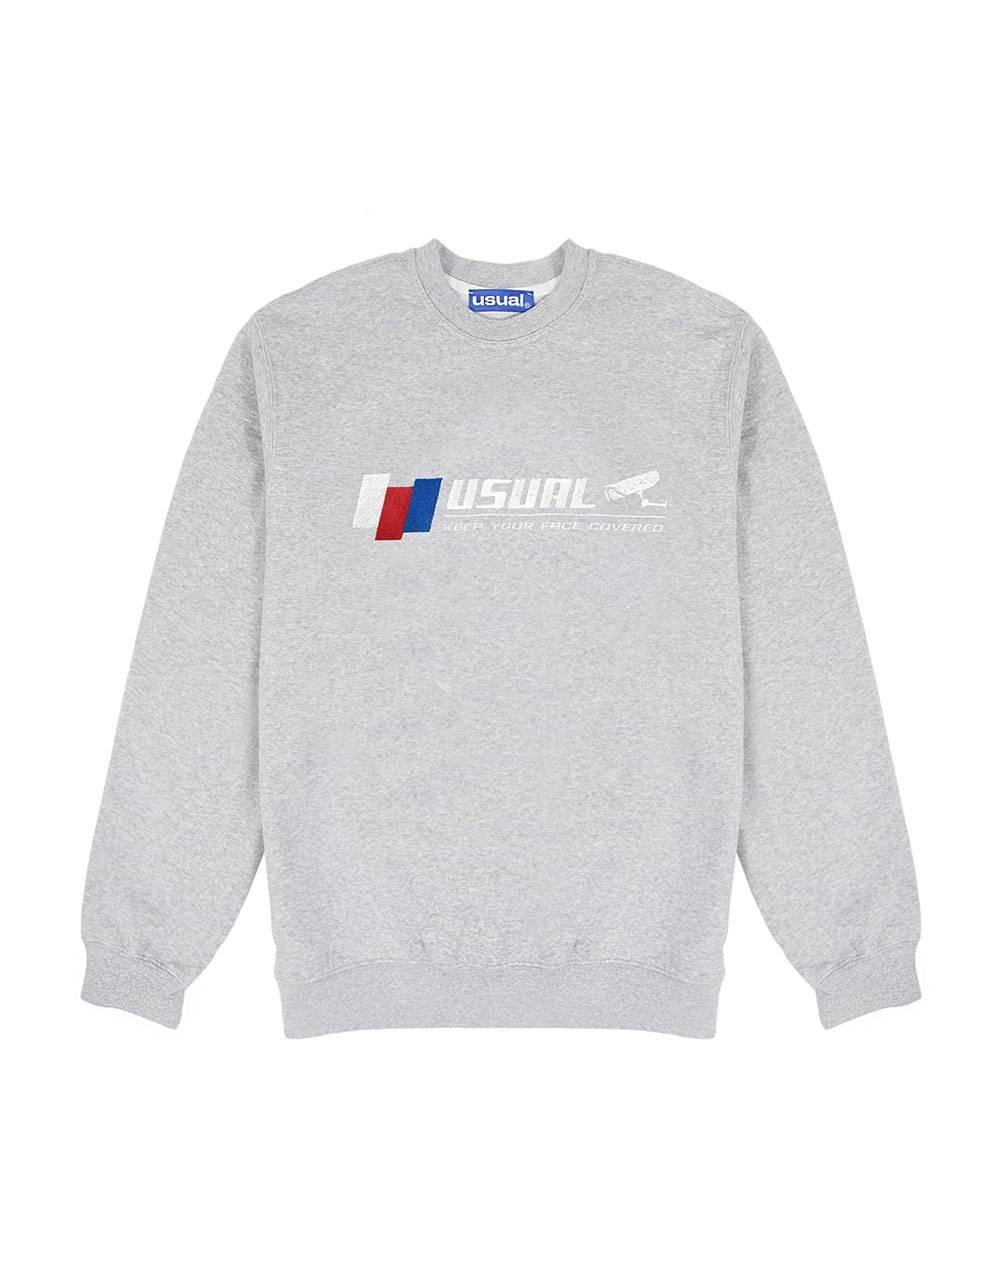 Usual CCTV crewneck sweater - melange grey Usual Sweater 96,00€